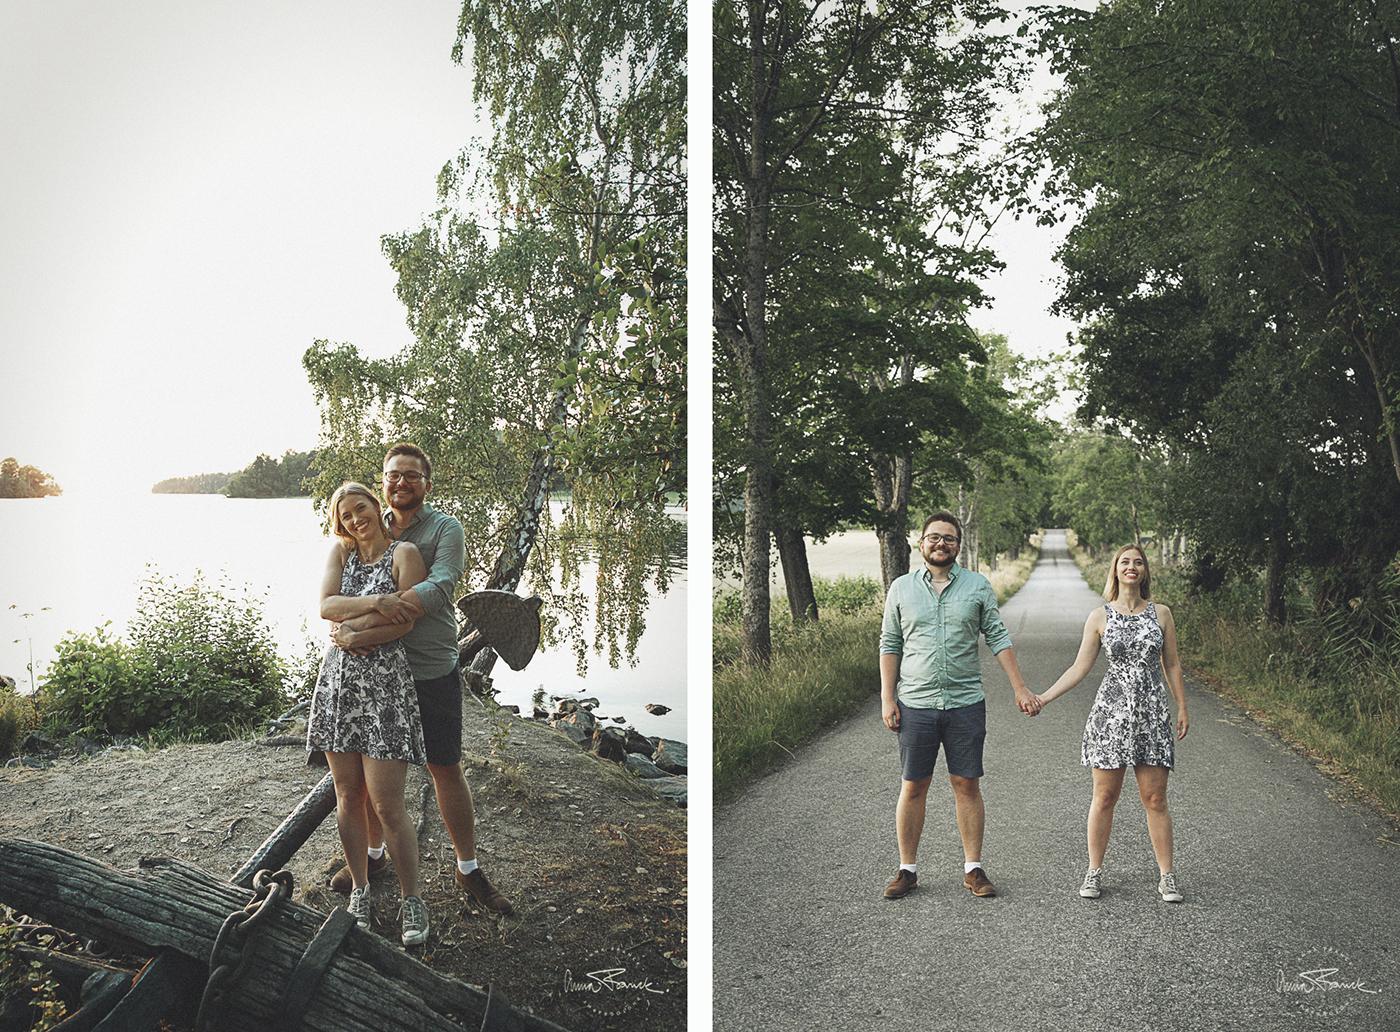 anna franck photography, portraits, fotograf, stockholm, pargas, valokuvaaja, hääkuvaus, bröllop, wedding